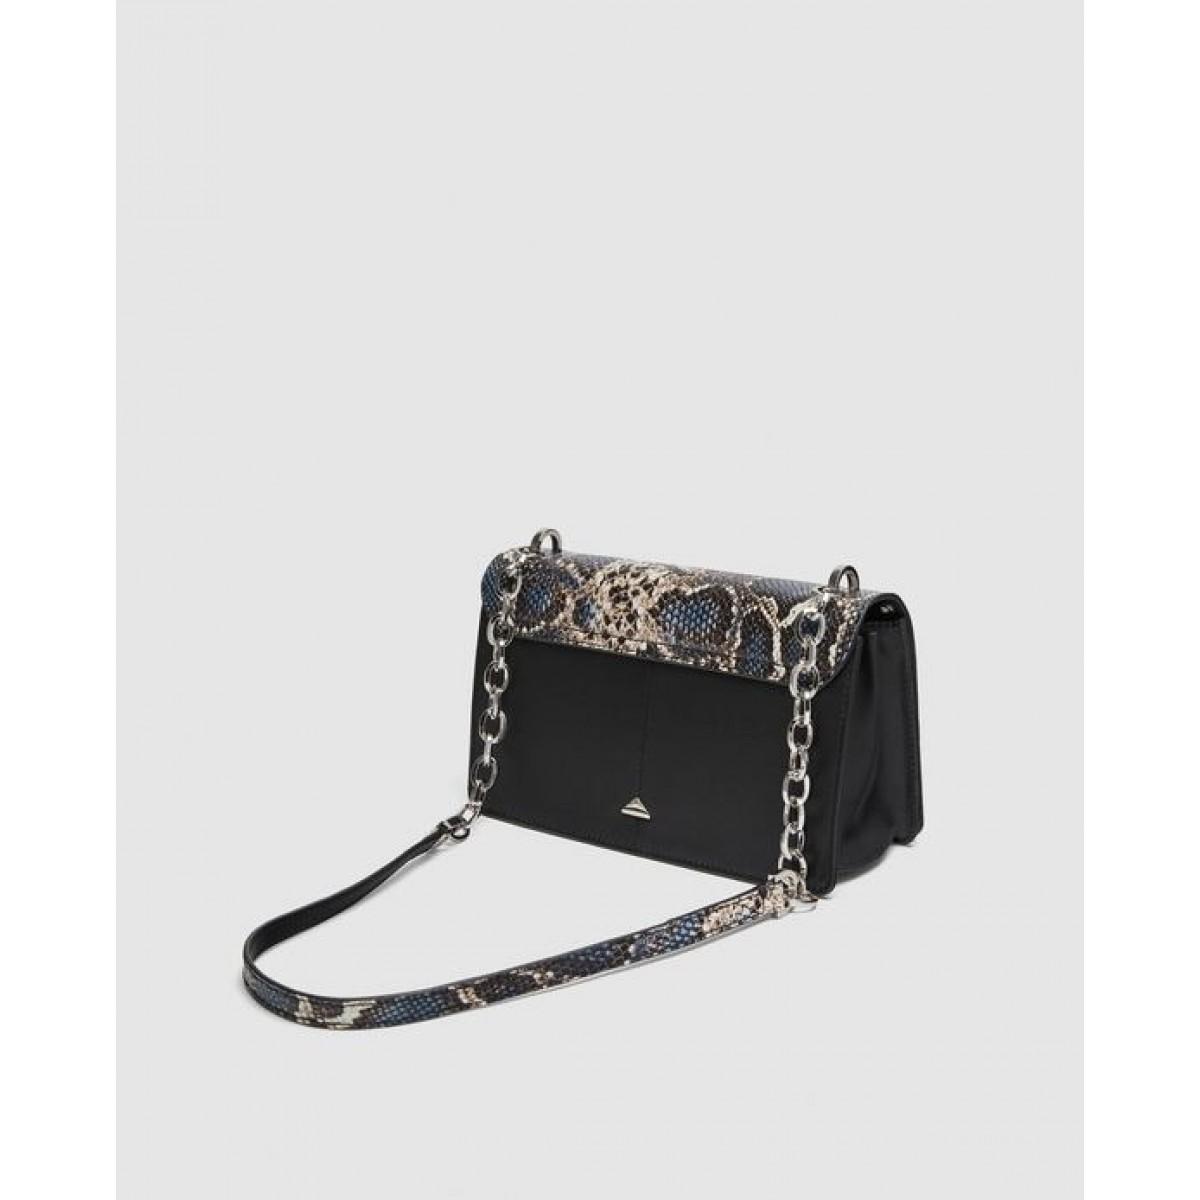 Zara Leather Crossbody Bag With Eyelets